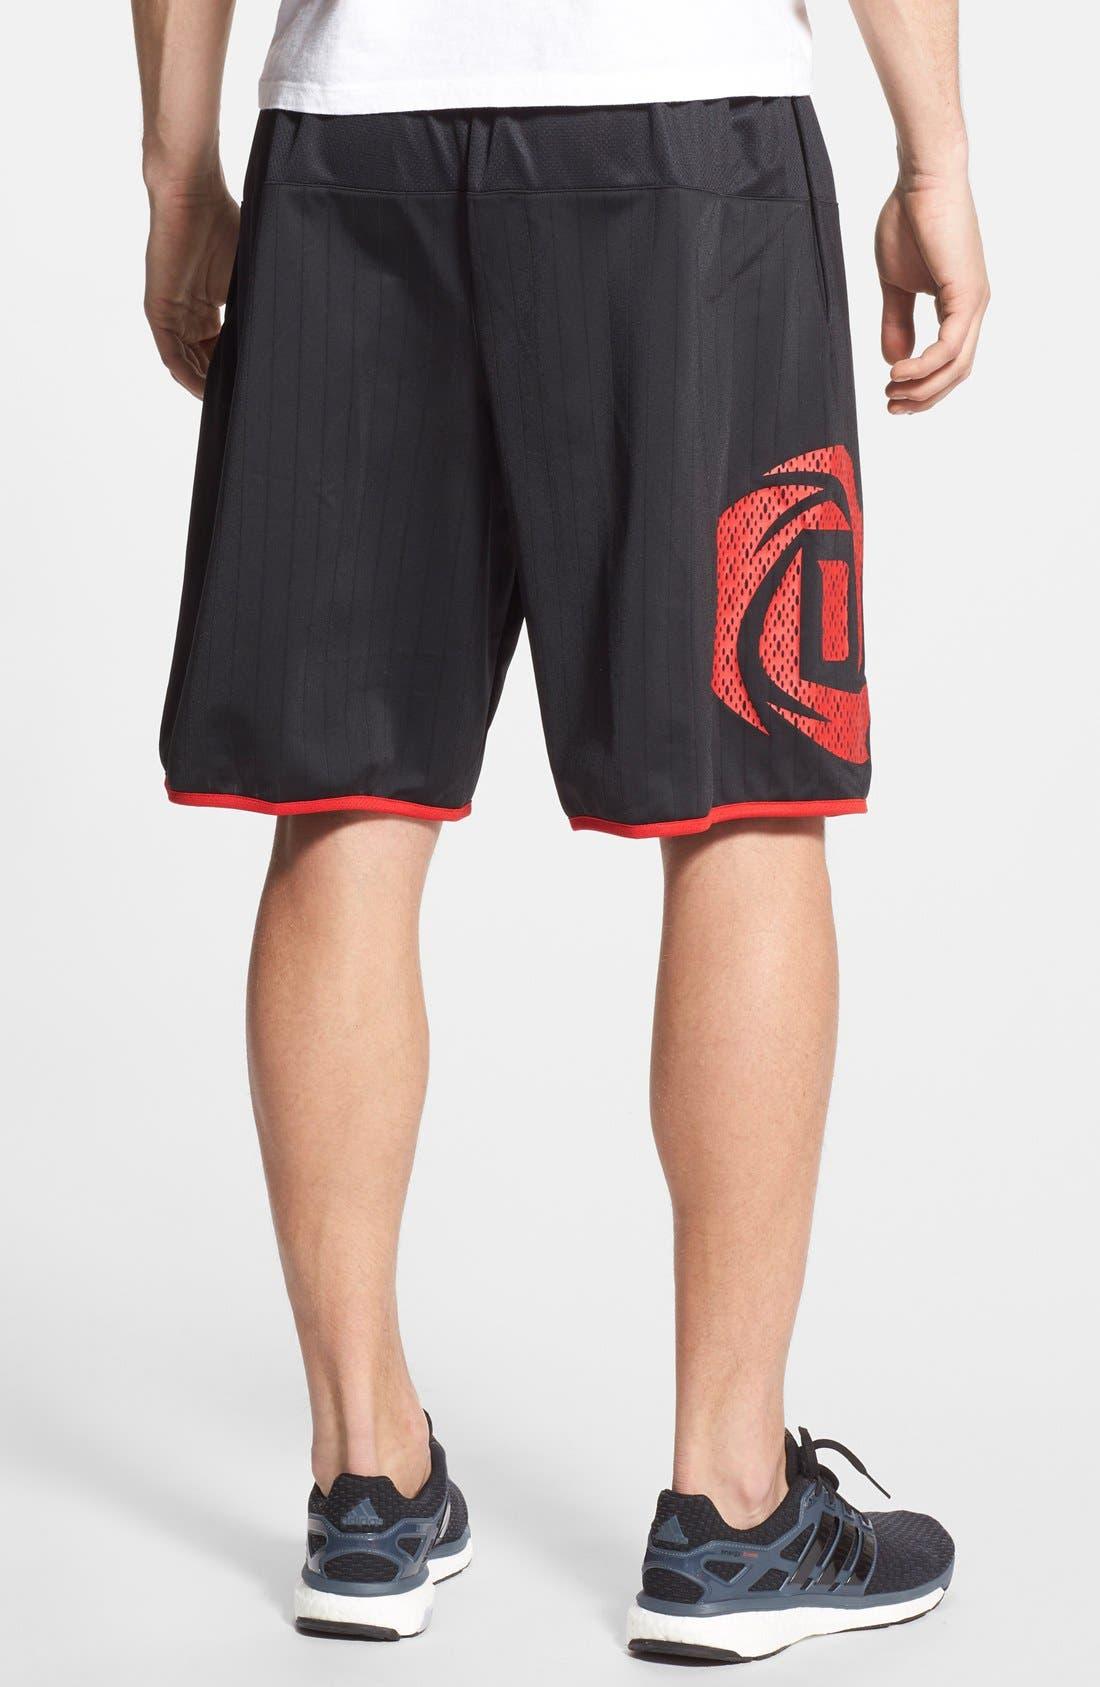 'D. Rose Jamfest' Basketball Shorts,                             Alternate thumbnail 2, color,                             001